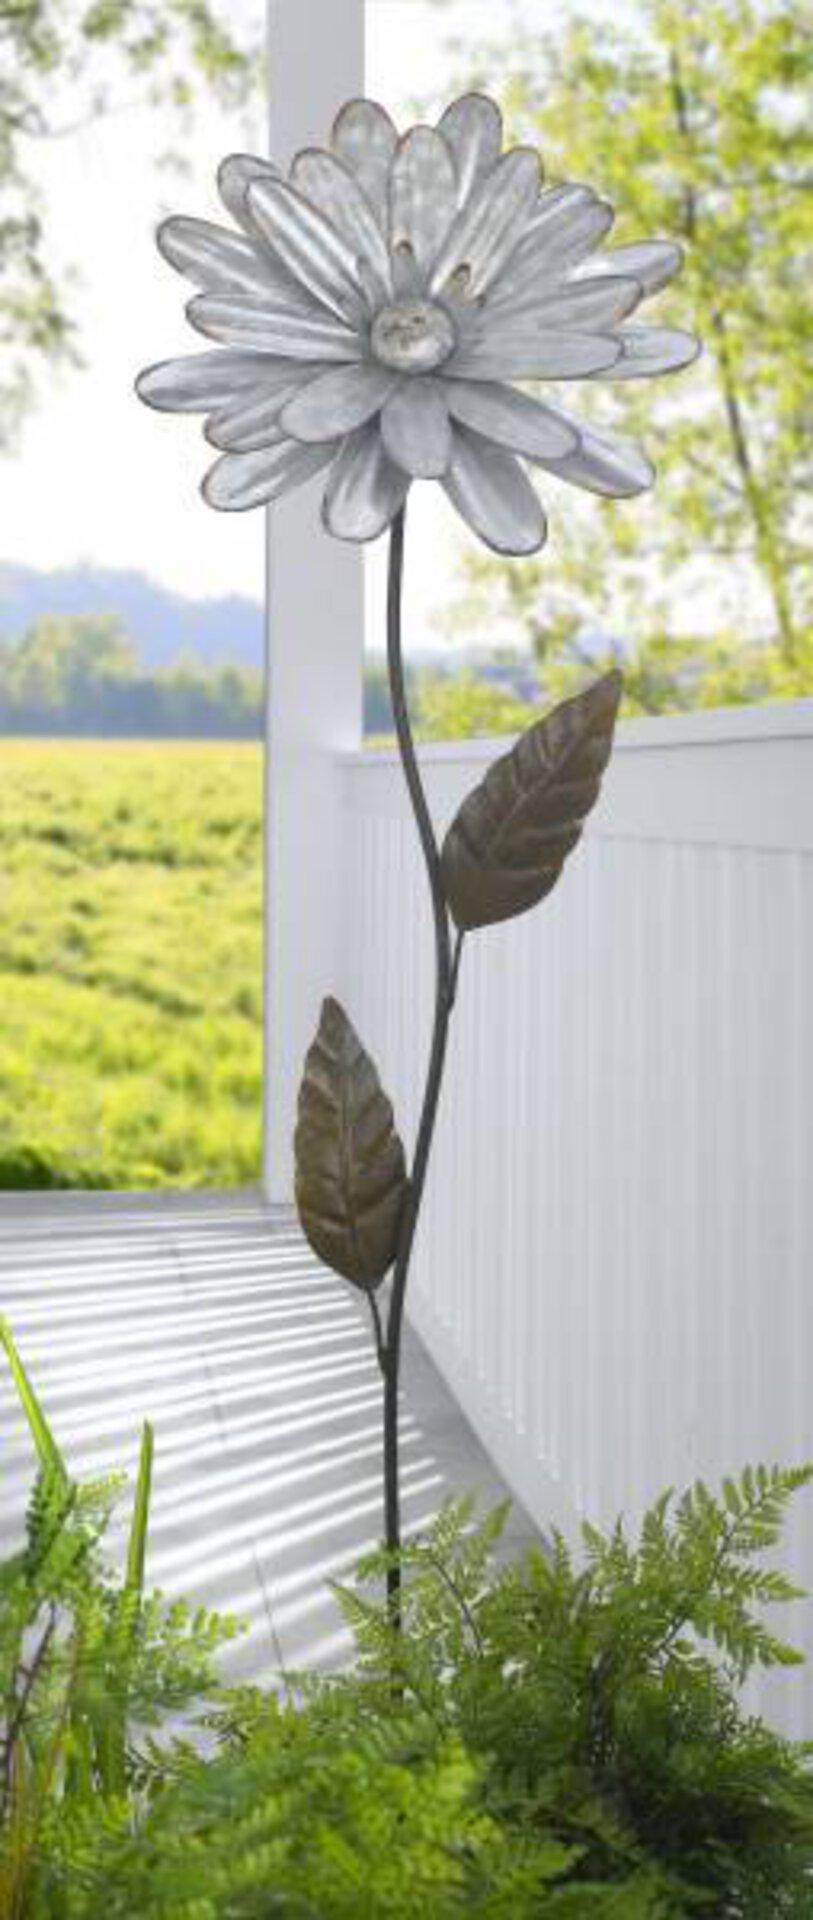 Gartendekoration 179907 Cottage Style by Casa Nova Casa Nova Metall silber